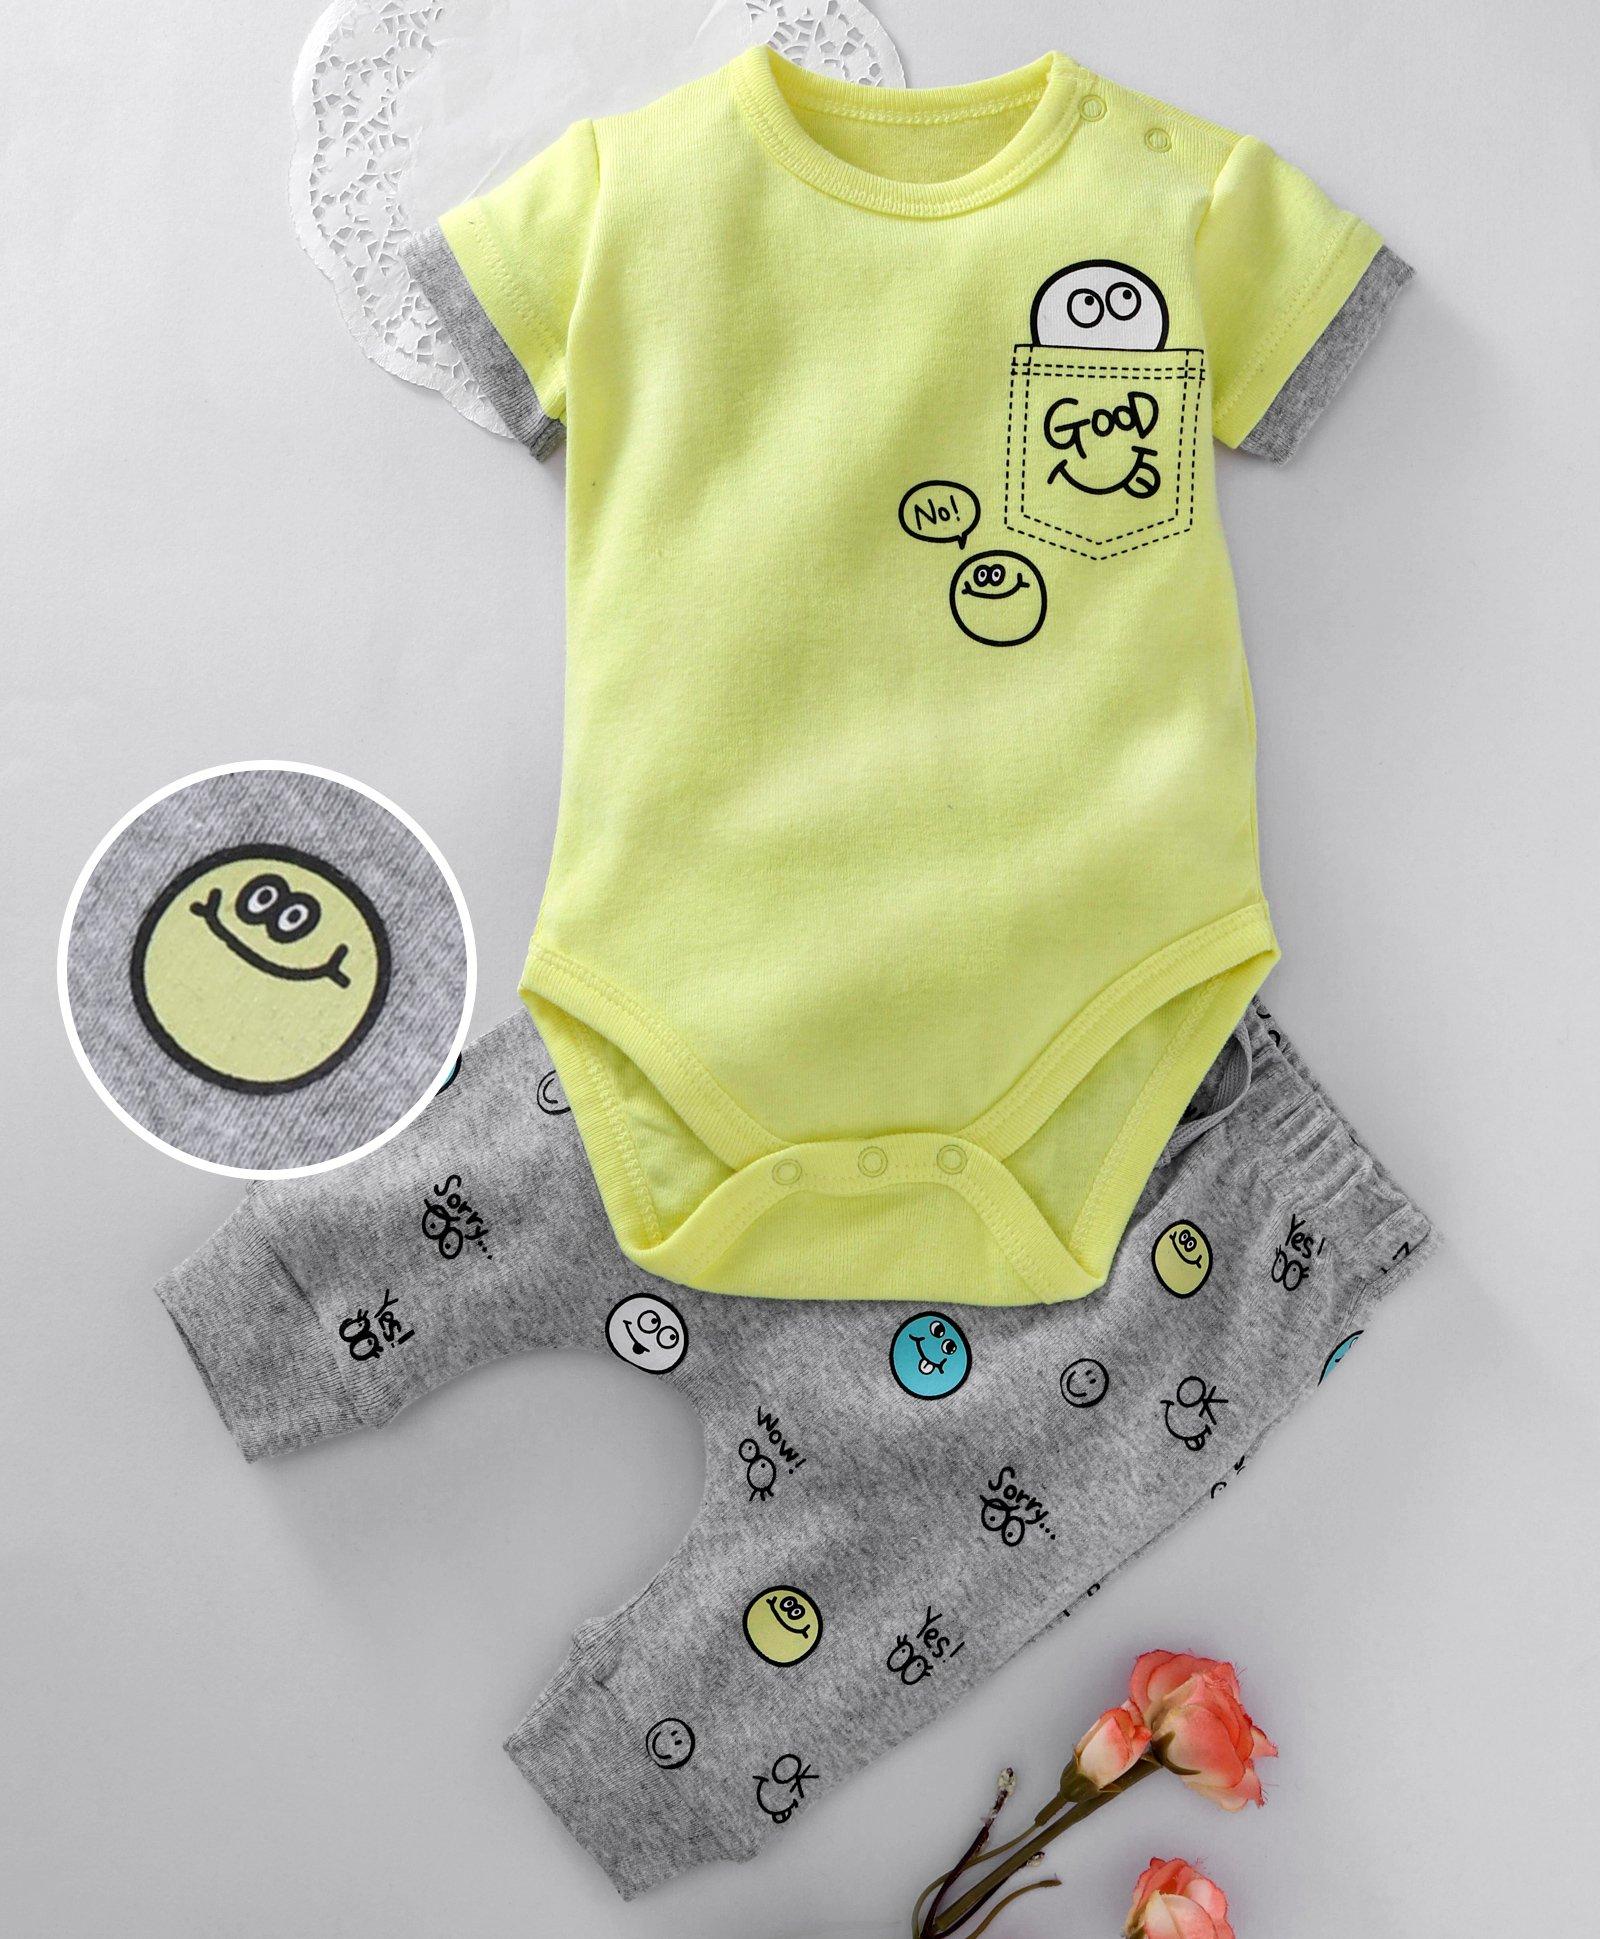 a1a3a227d3d8 Fox Baby Short Sleeves Onesie And Diaper Leggings Multiprint - Lemon Green  Grey